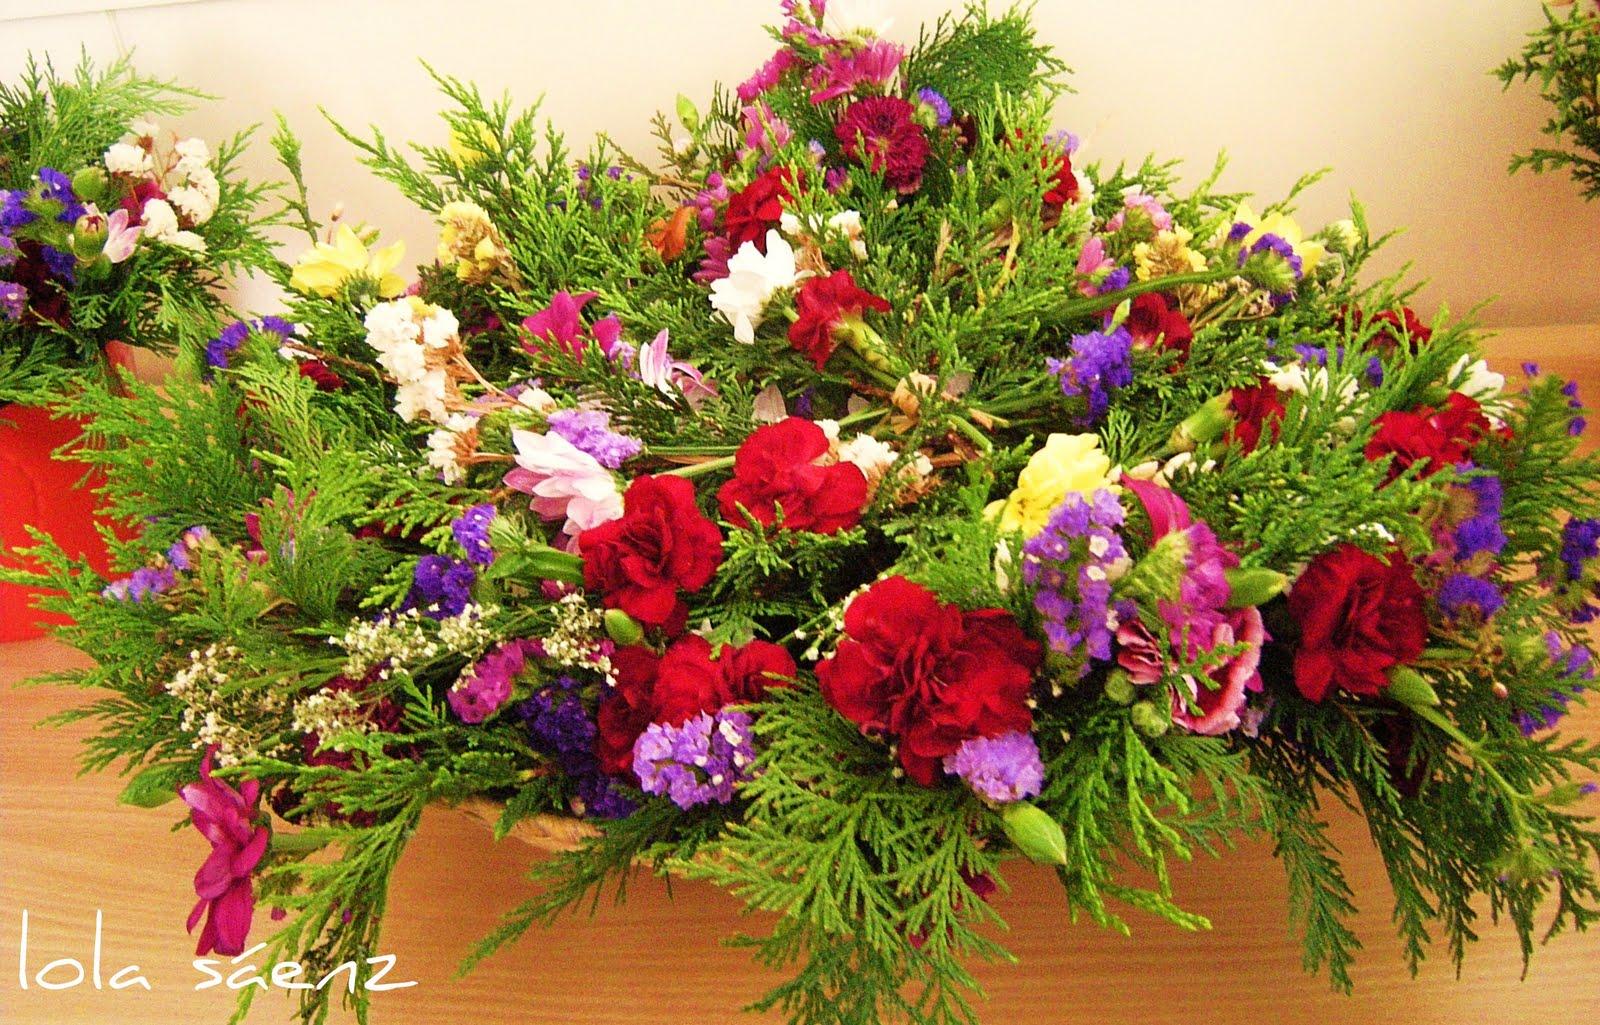 Flores naturales centro de flores - Centros de plantas naturales ...